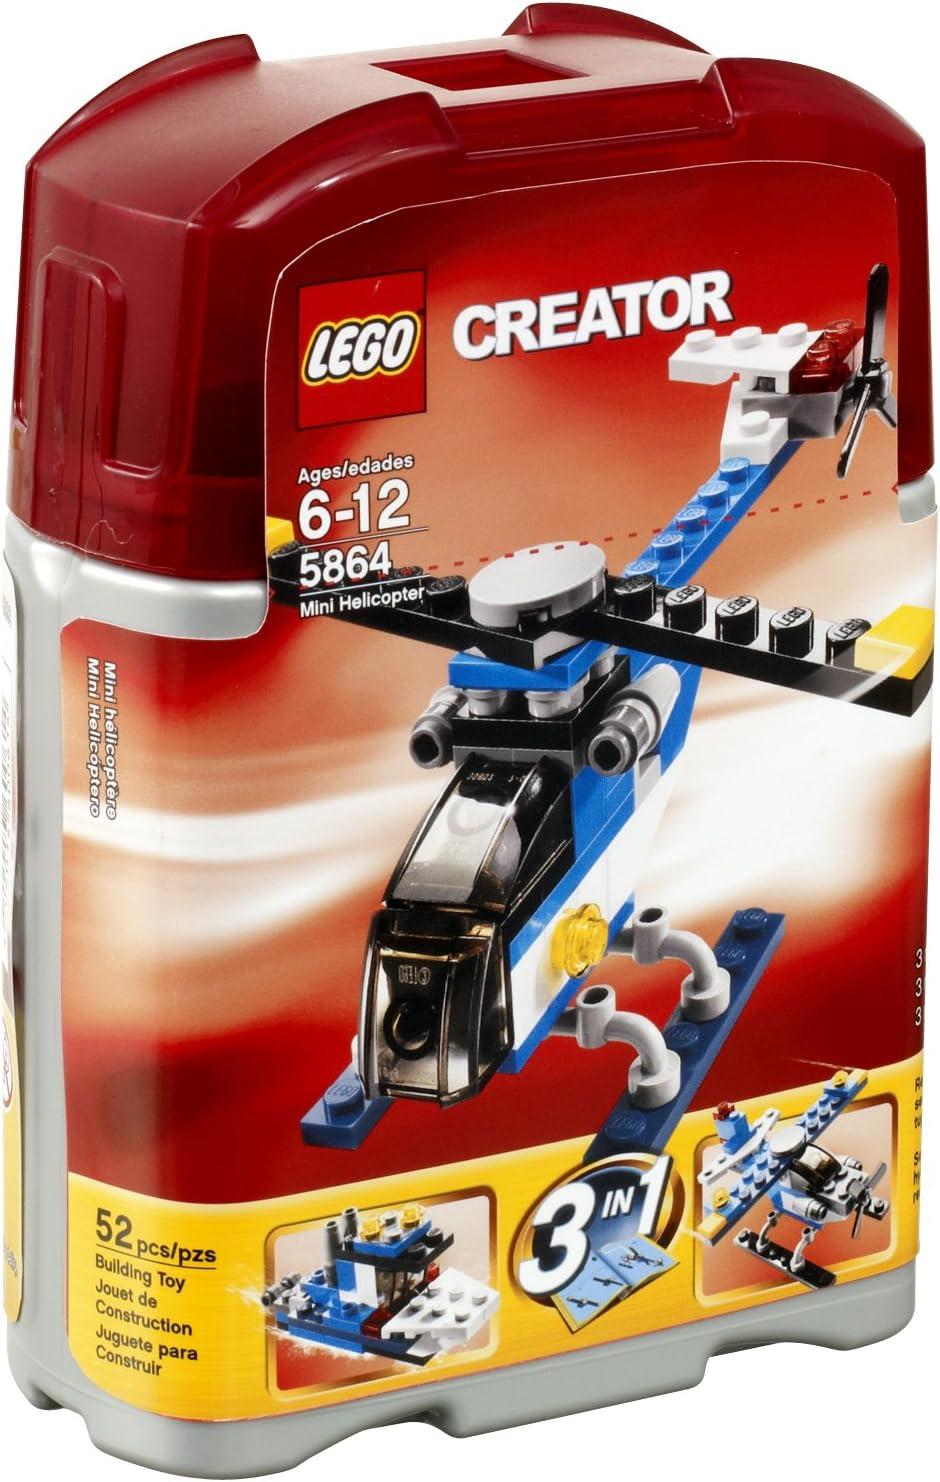 LEGO Mini Helicopter 5864